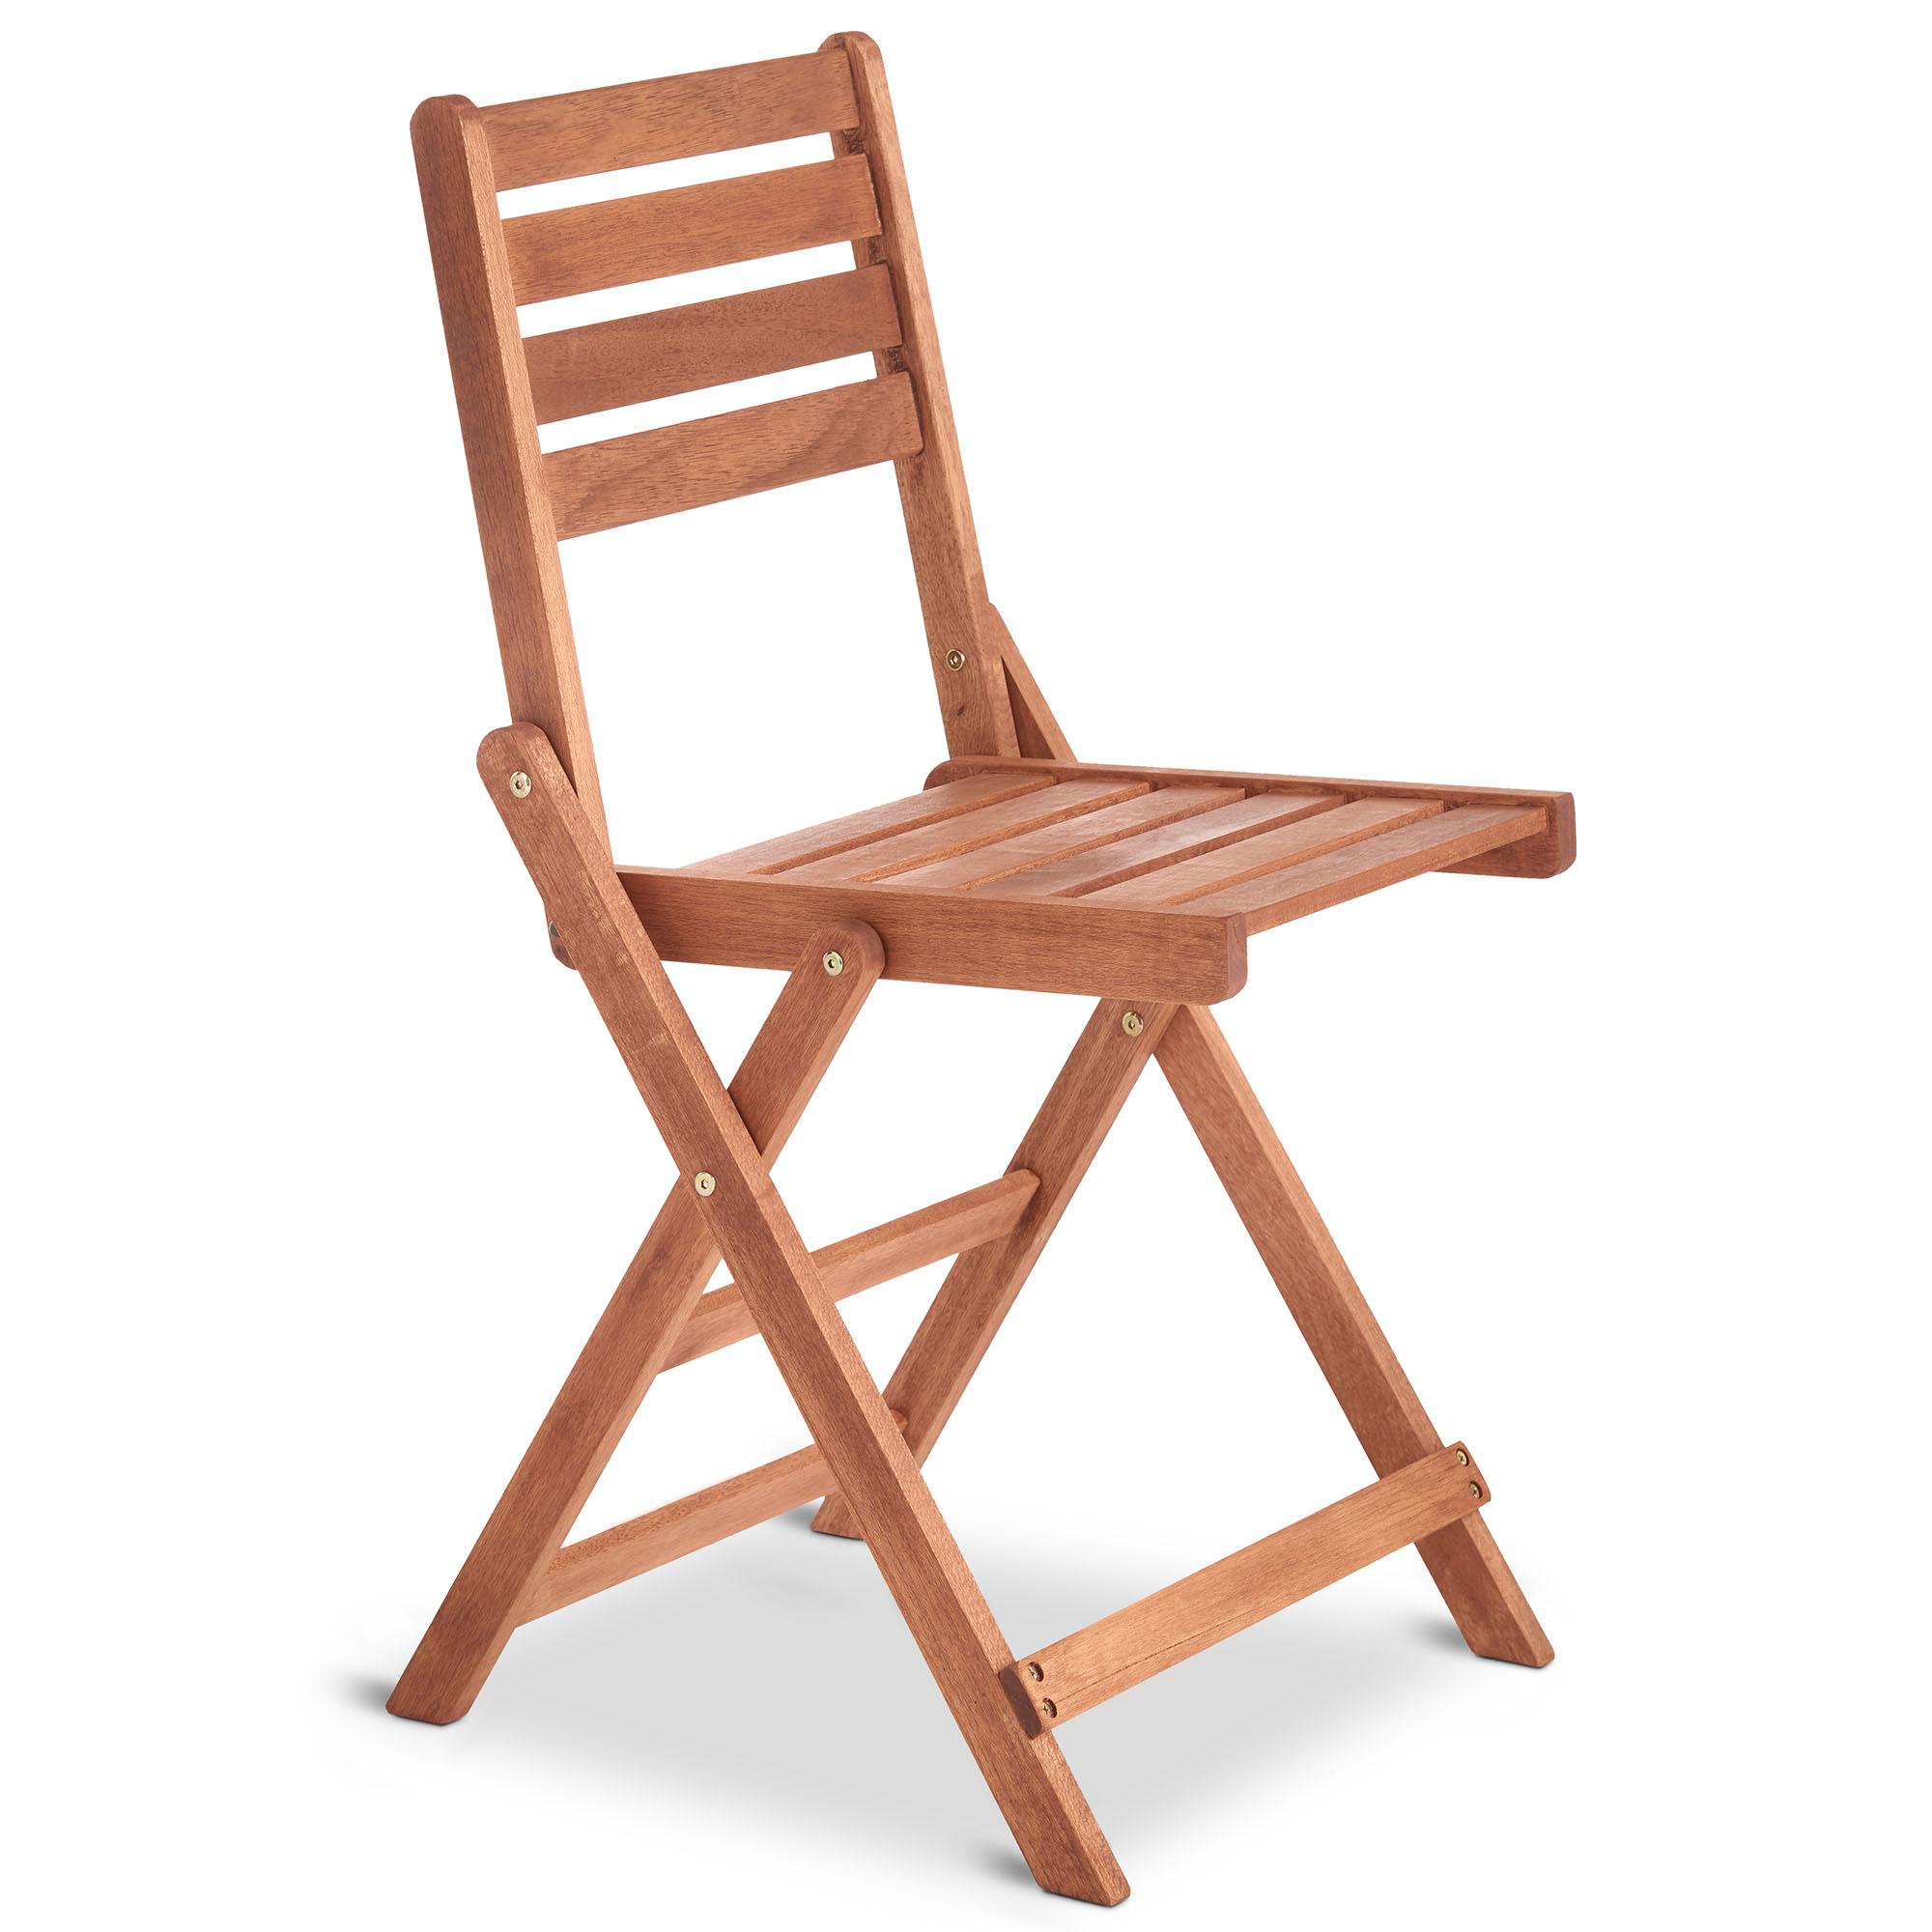 outdoor wooden folding chairs collapsible hammock chair vonhaus set of 2 hardwood garden